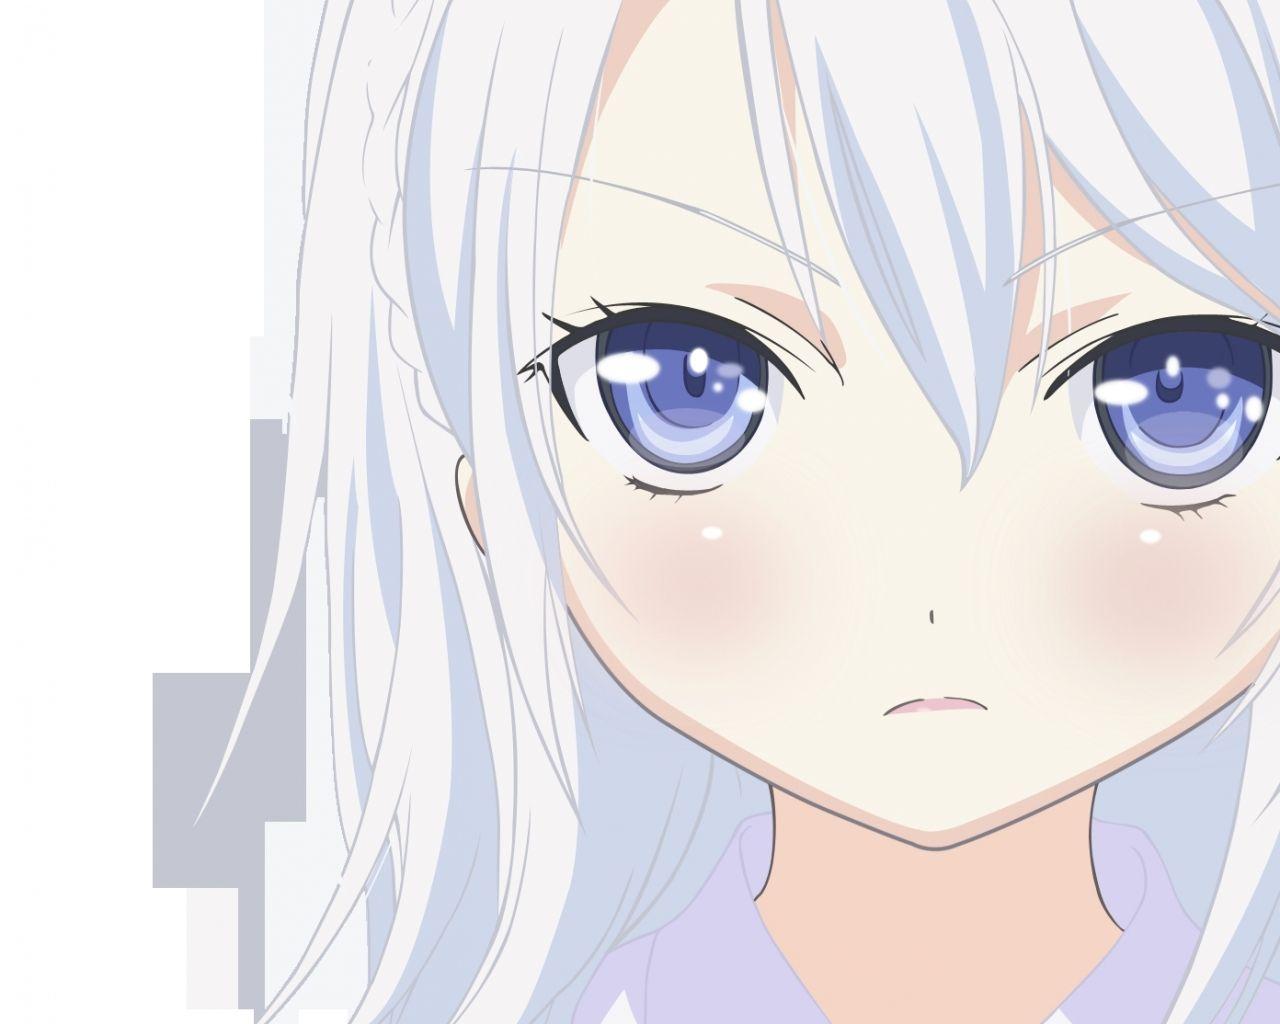 pin by liz bohnen on anime pinterest white hair anime